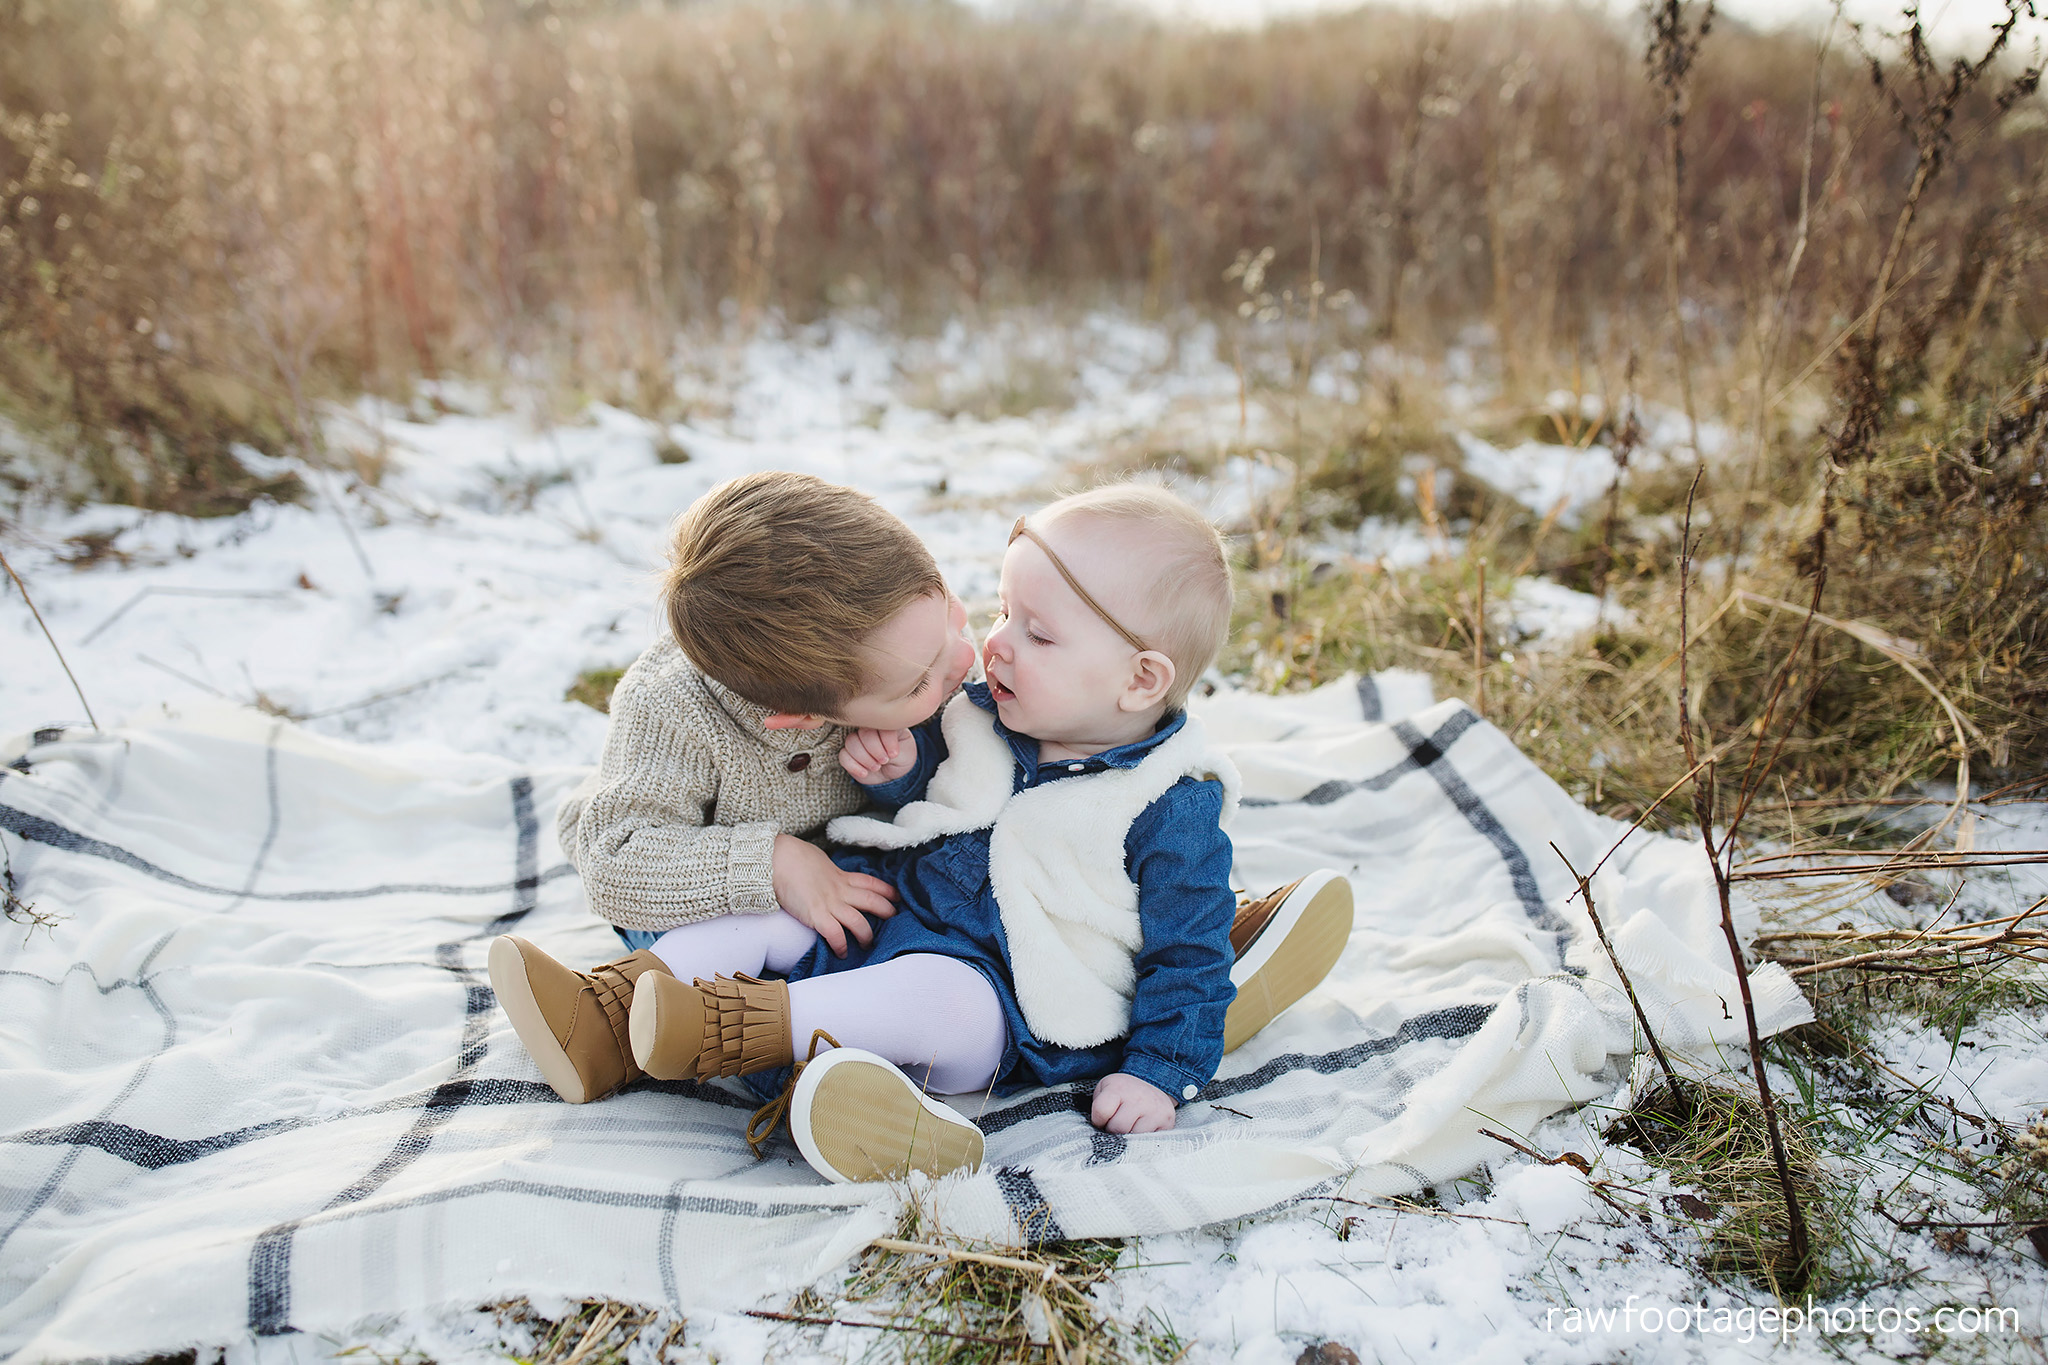 london_ontario_family_photographer-greenhouse_photos-winter_field_photos-raw_footage_photography005.jpg